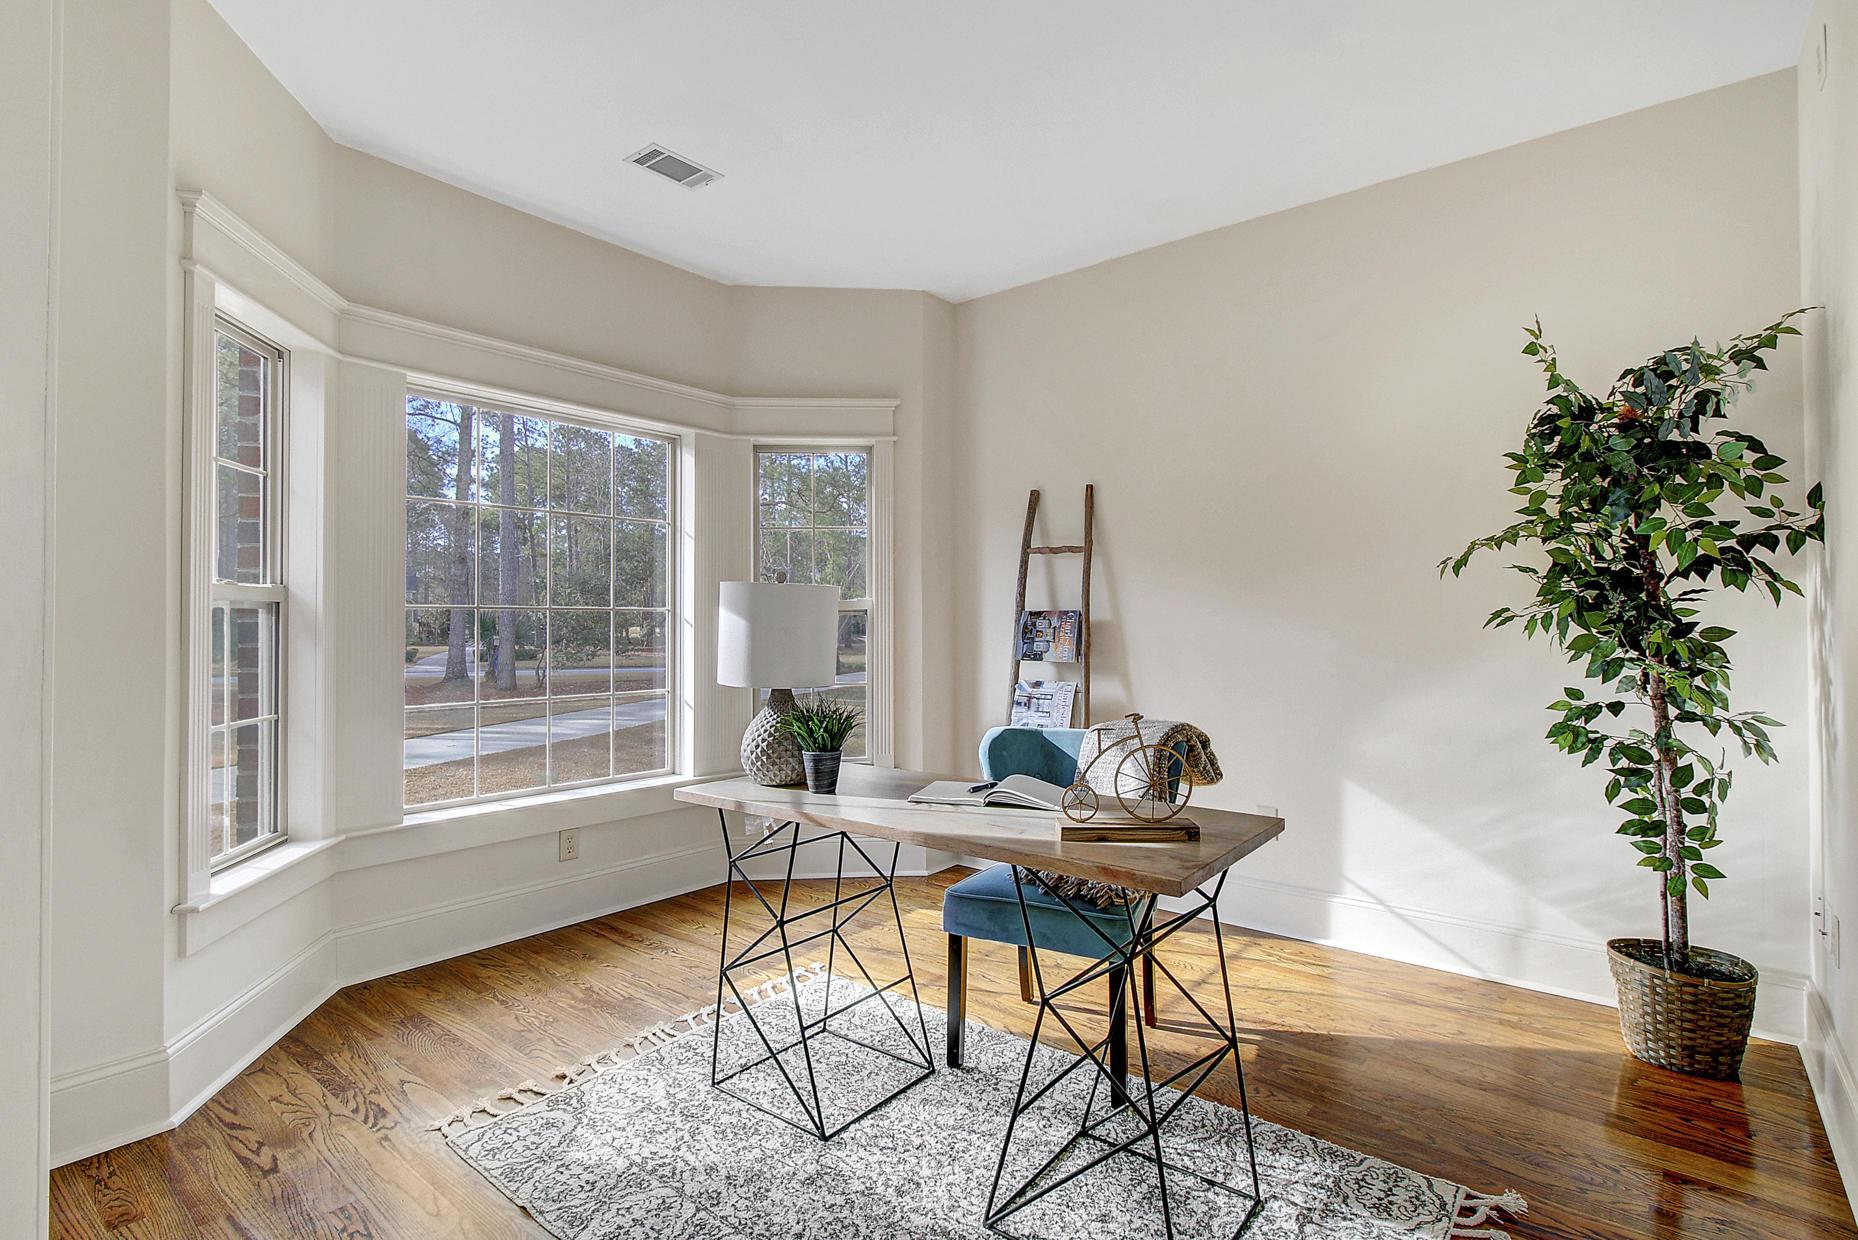 Dunes West Homes For Sale - 4123 Colonel Vanderhorst, Mount Pleasant, SC - 23